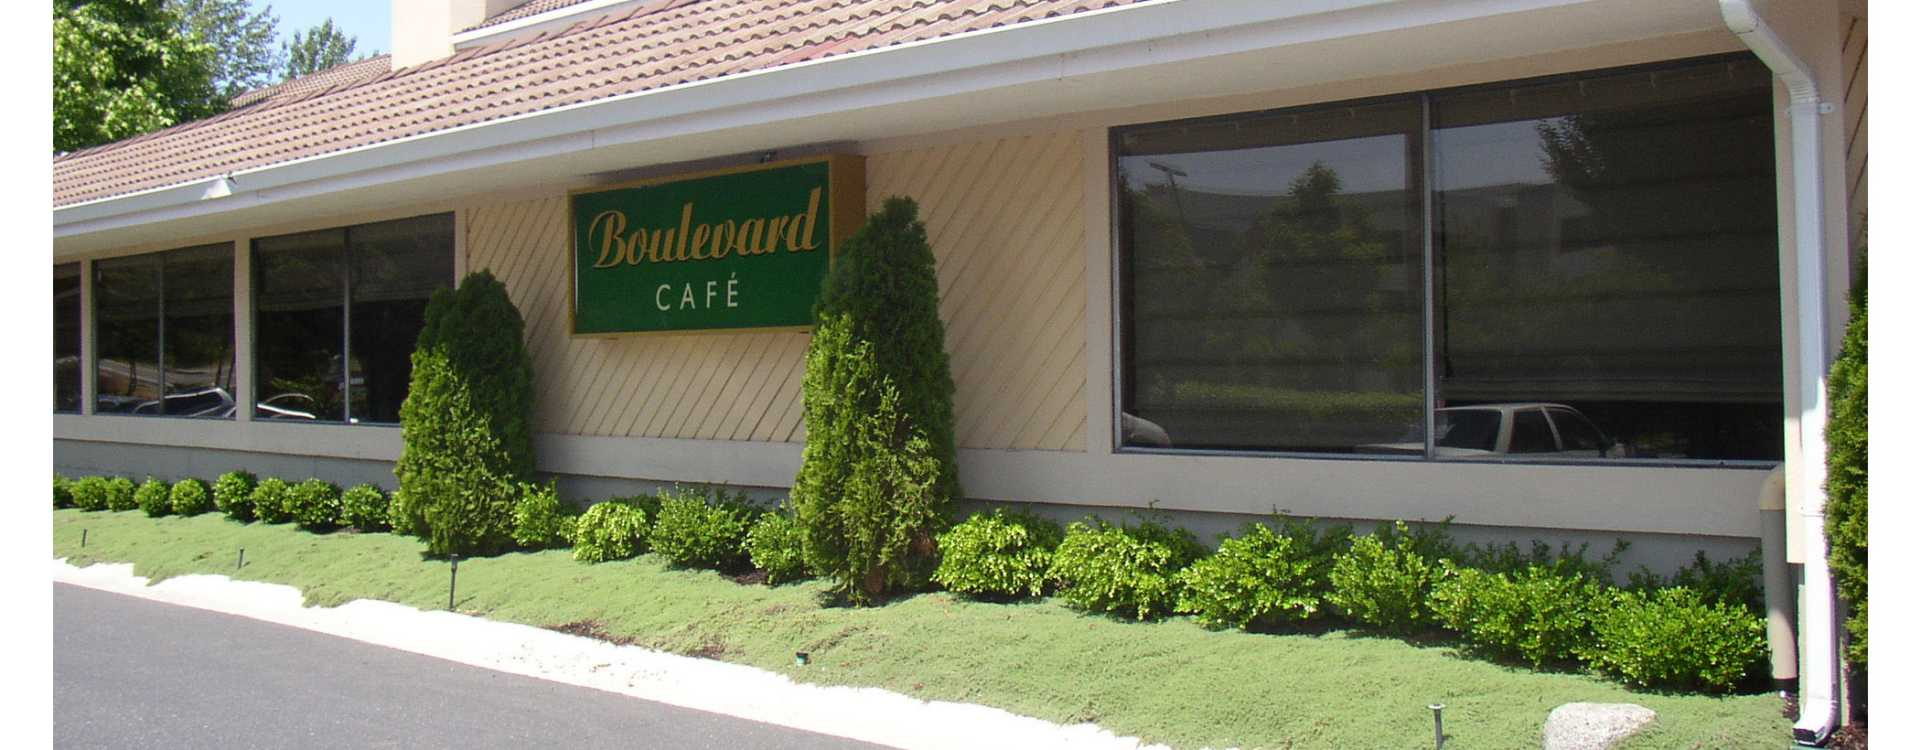 Boulevard_Cafe___Lounge.jpg